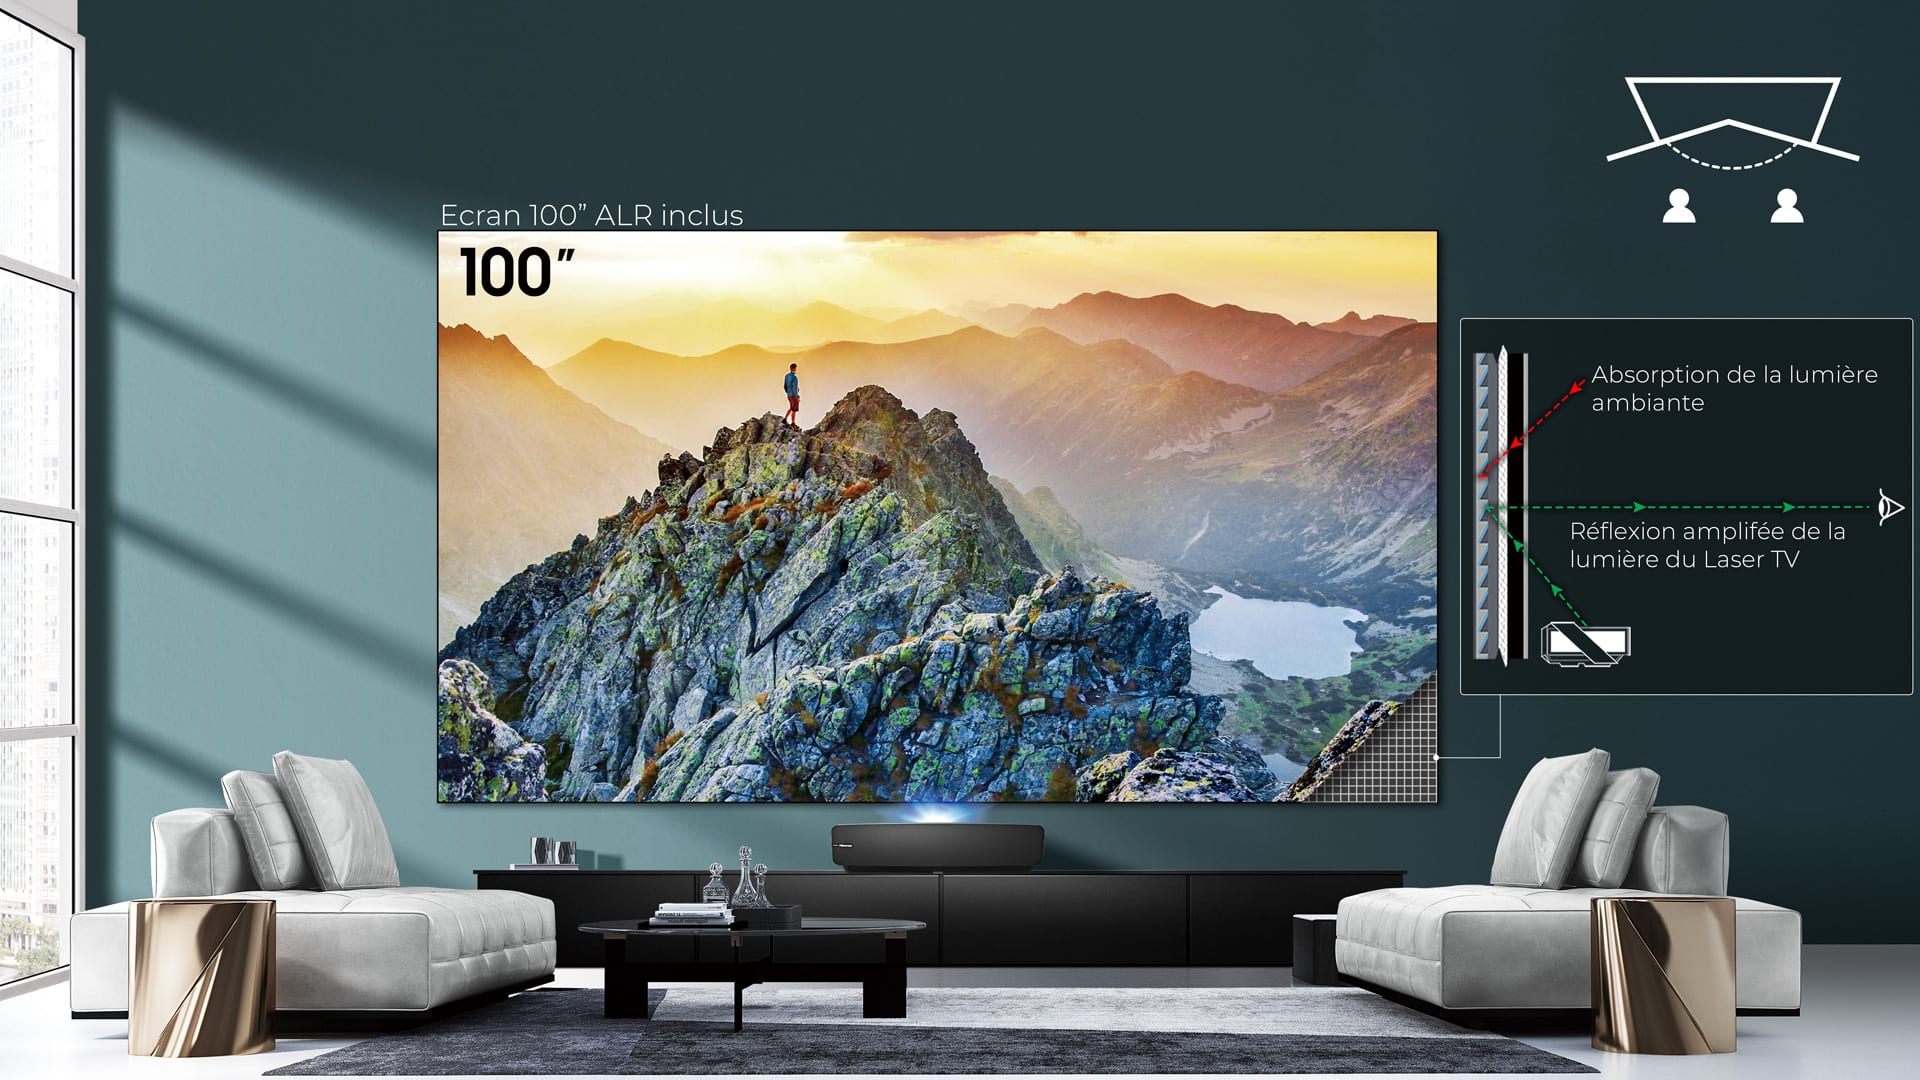 01-100-inch-optimized-big-screen-flixmeedia-2020